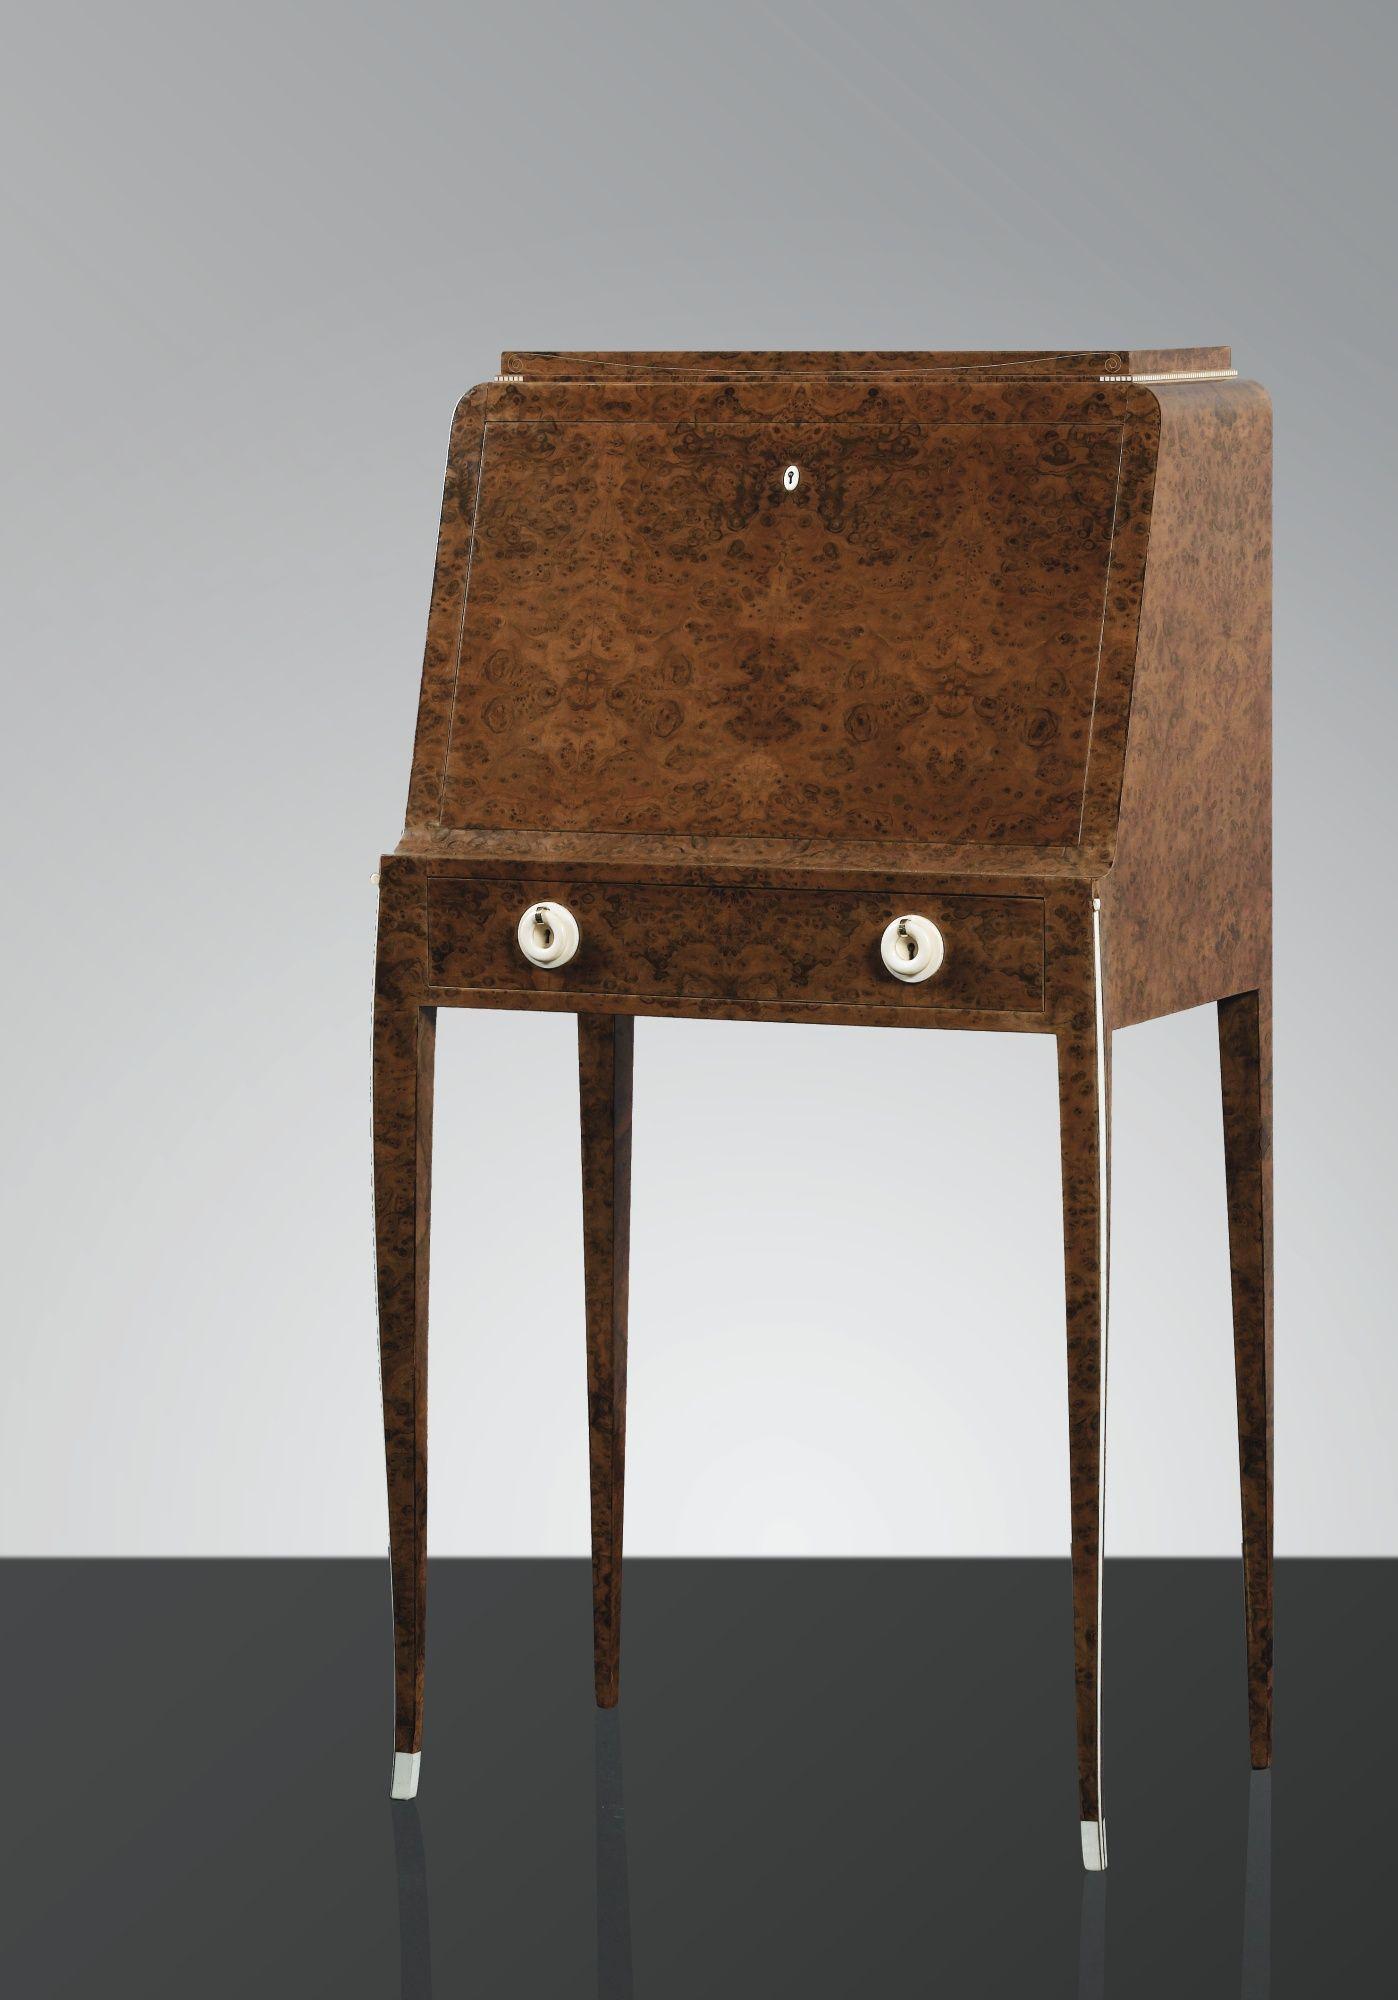 Emile Jacques Ruhlmann Lot French Art Deco Furniture Art Nouveau Furniture Deco Furniture